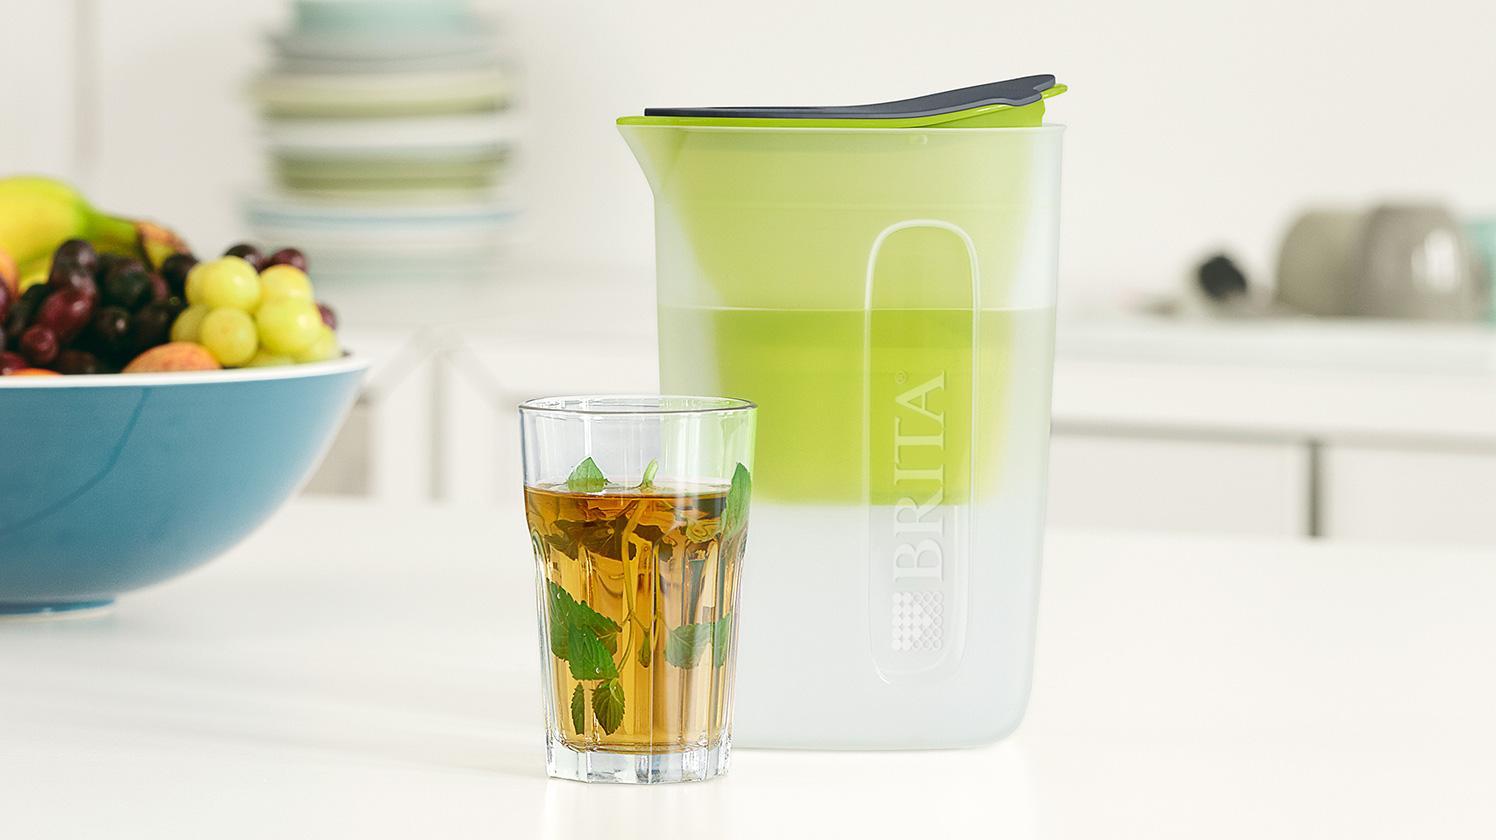 BRITA fill&enjoy Fun lime kuchnia szklanka herbata